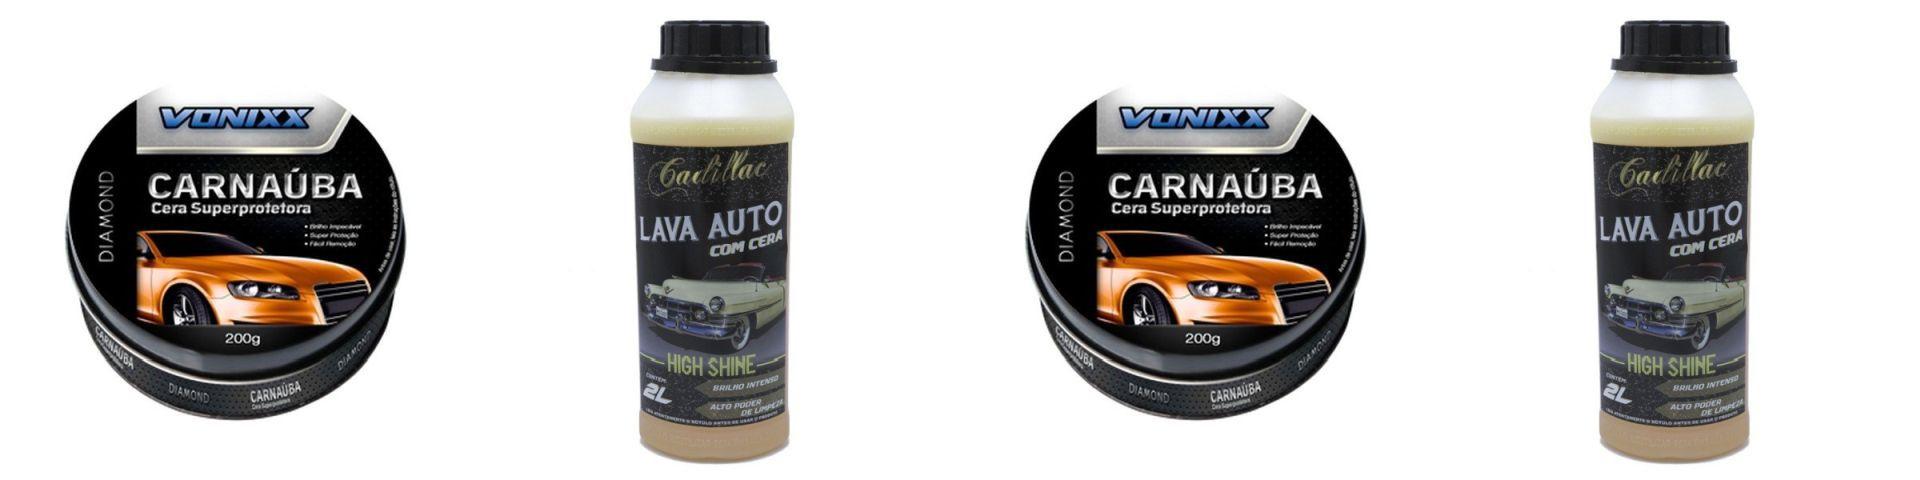 Kit 2 Cera De Carnauba+2 Lava Auto Com Cera